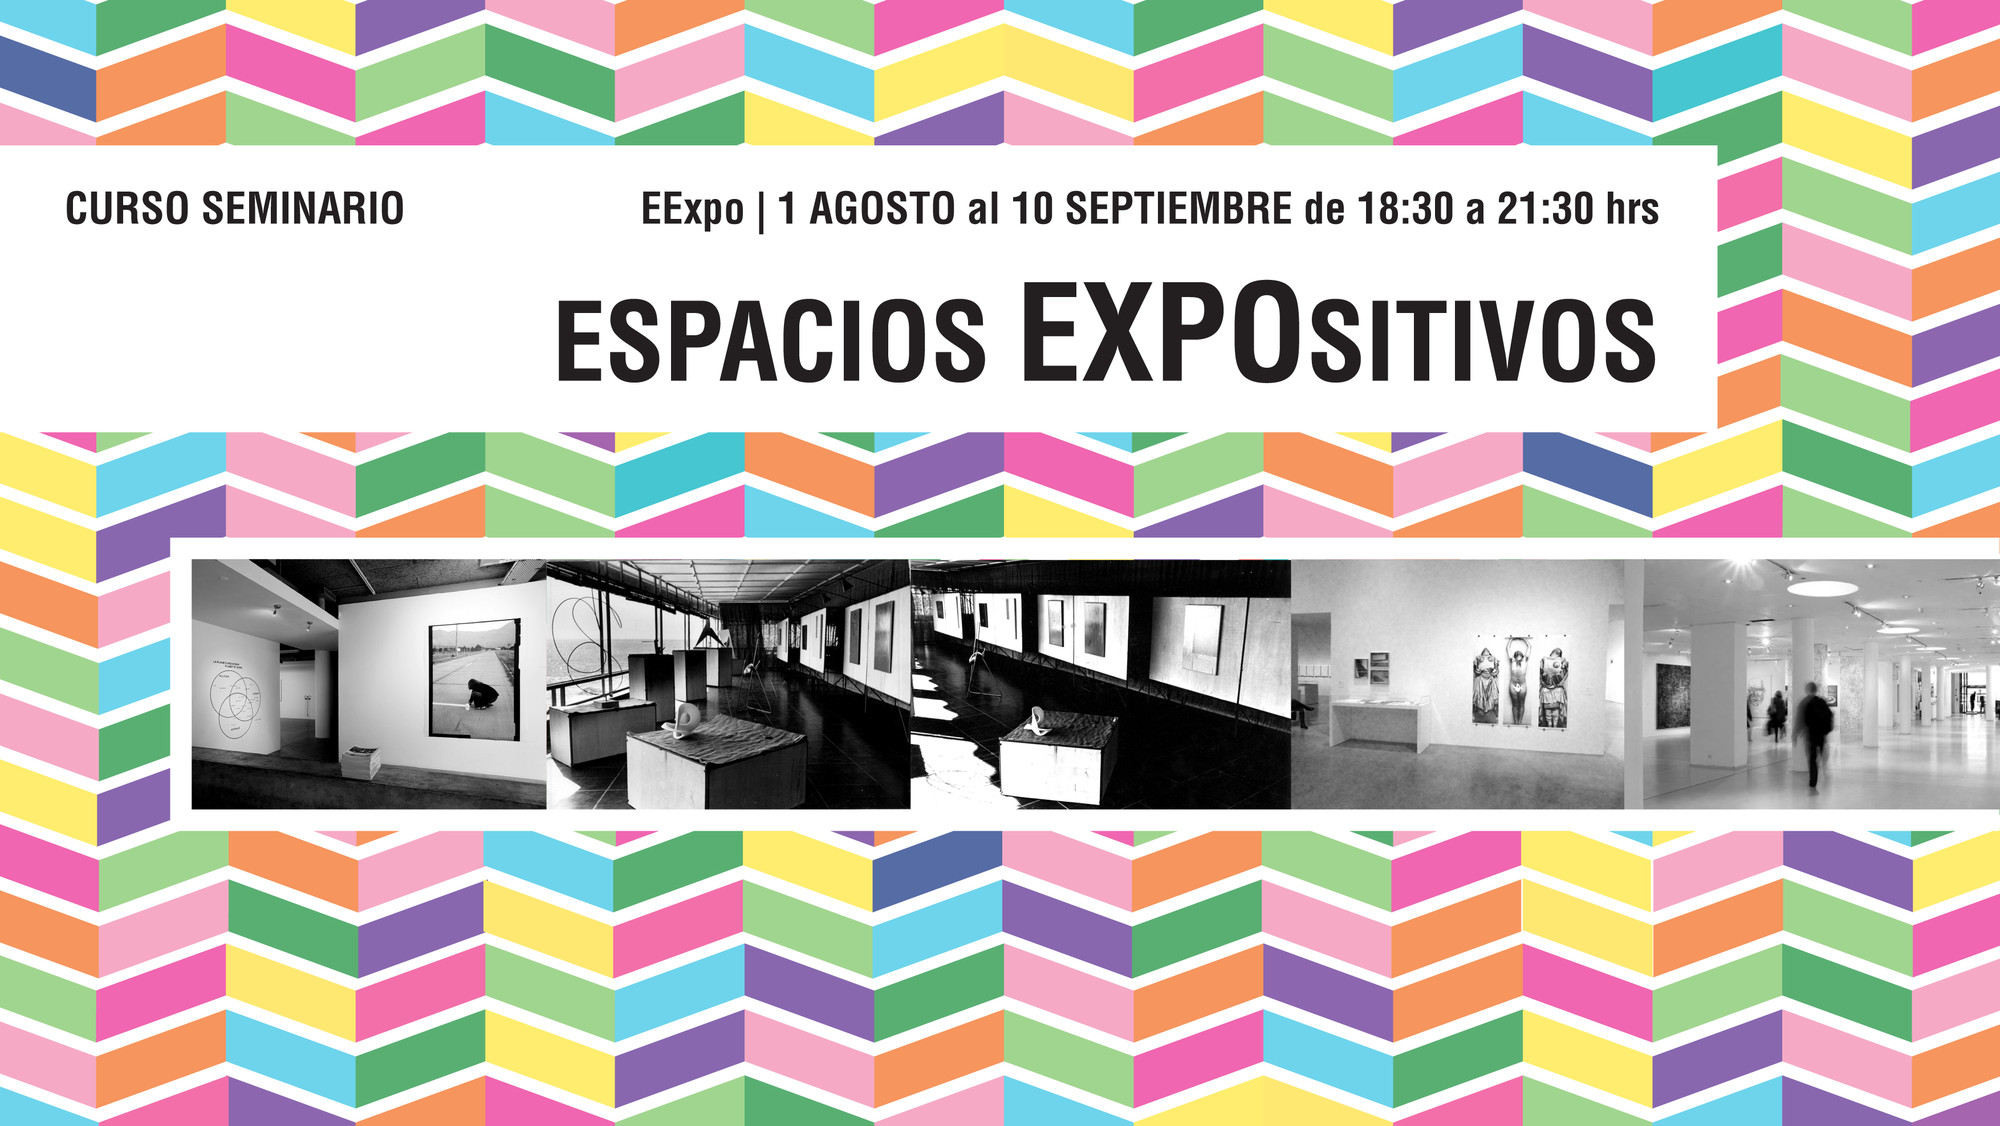 Curso|Seminario Espacios EXPOsitivos, Escuela de Arquitectura UC